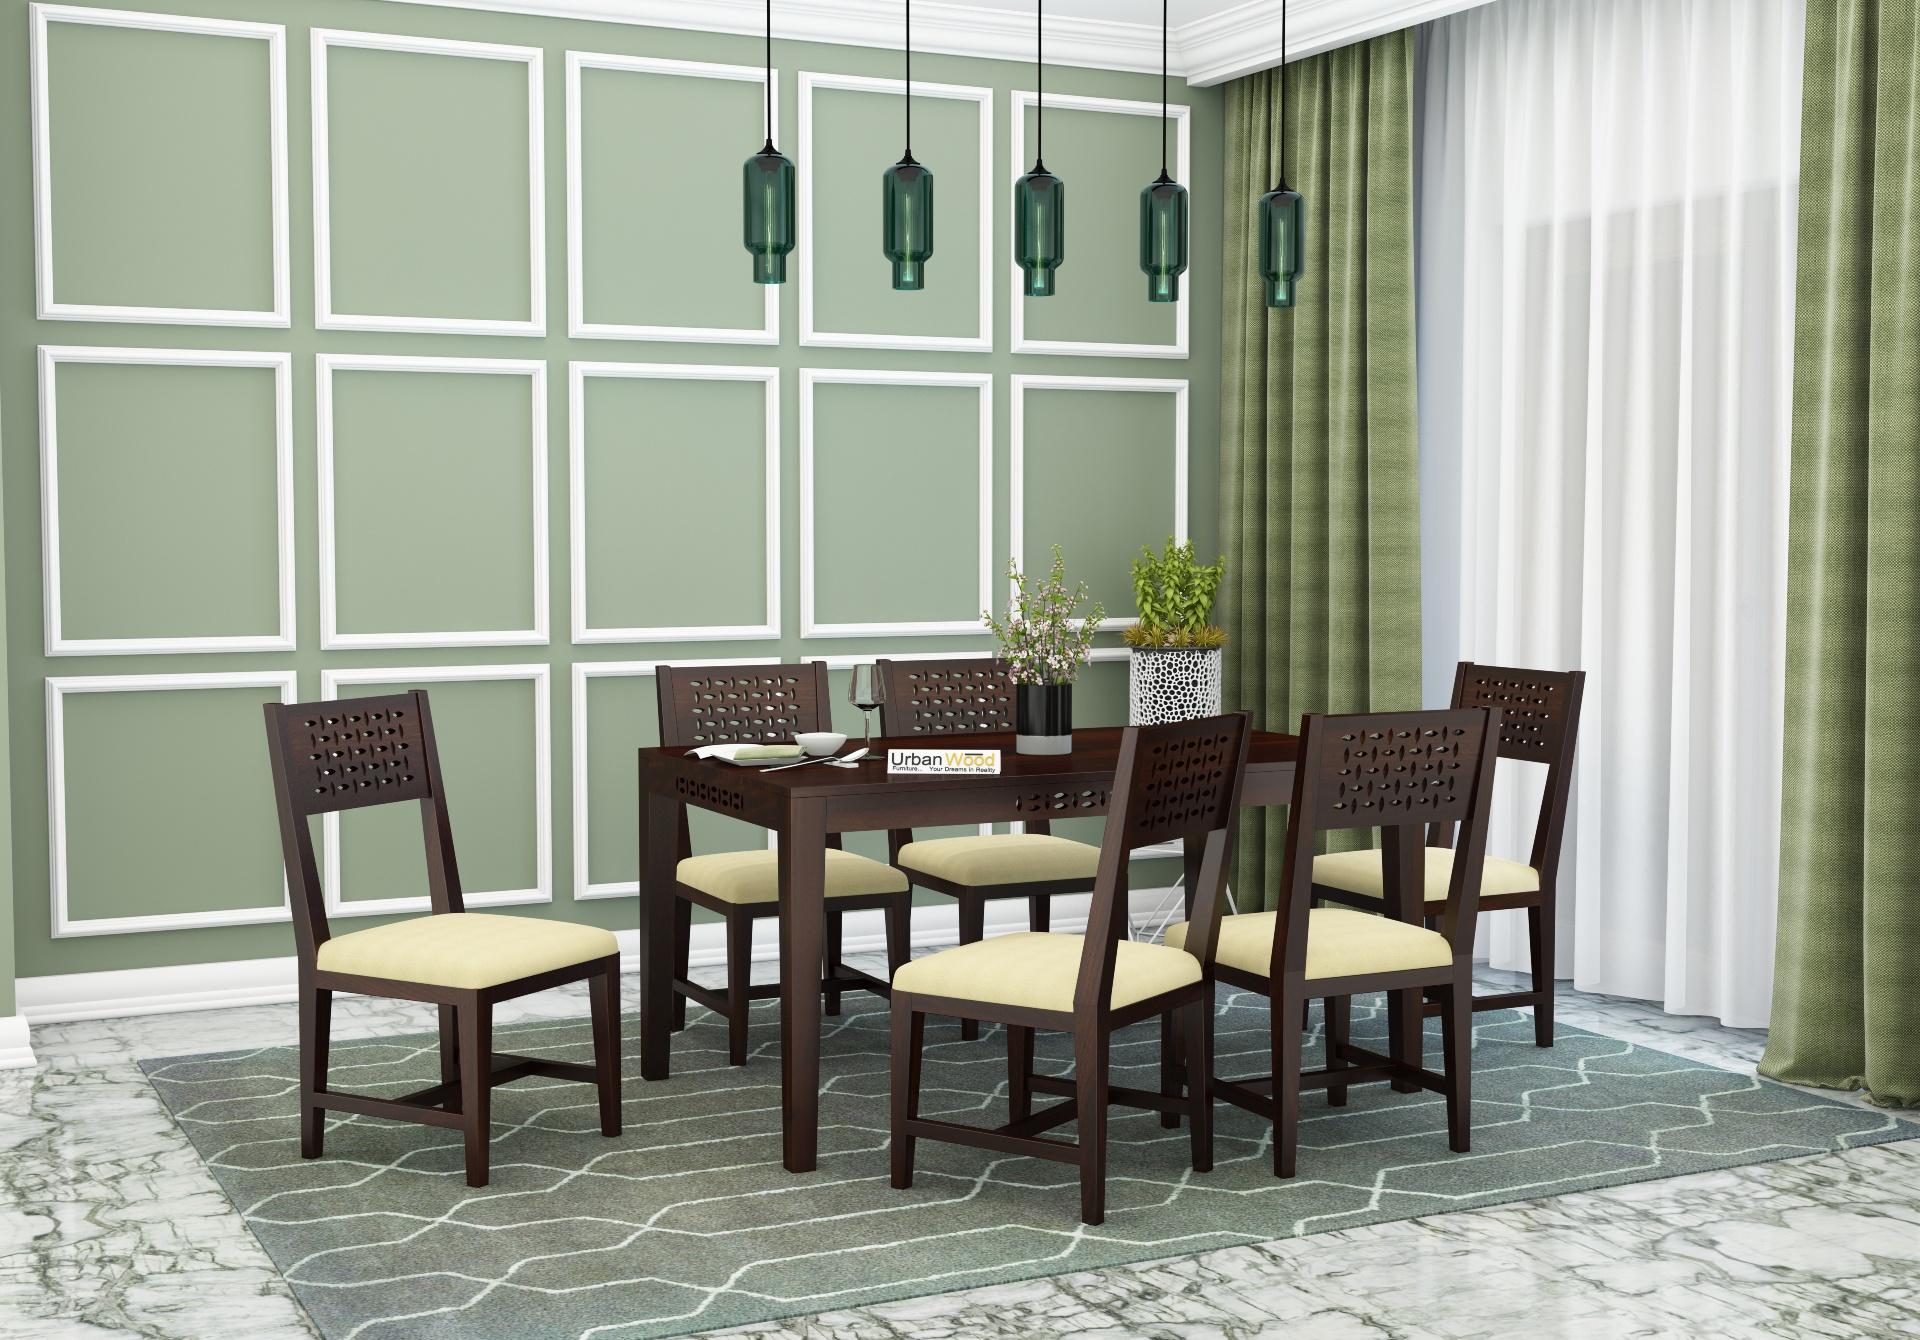 Woodora 6 Seater Dining Set with Cushion <small>(Walnut Finish)</small>